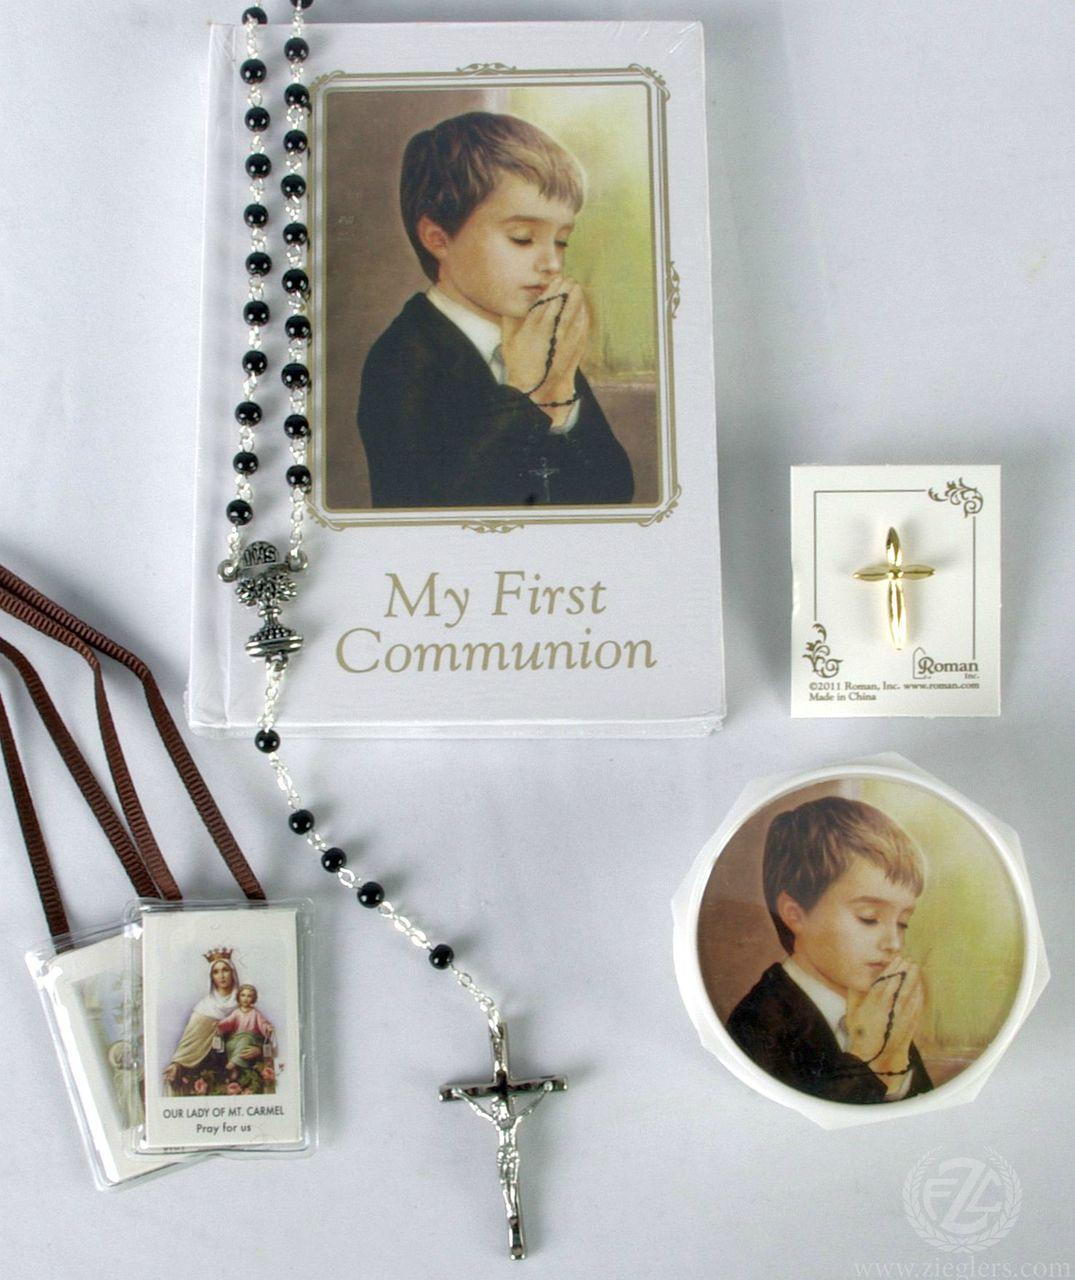 My First Communion   Missal Set   Boy   Style RO41478 - F.C. Ziegler Company